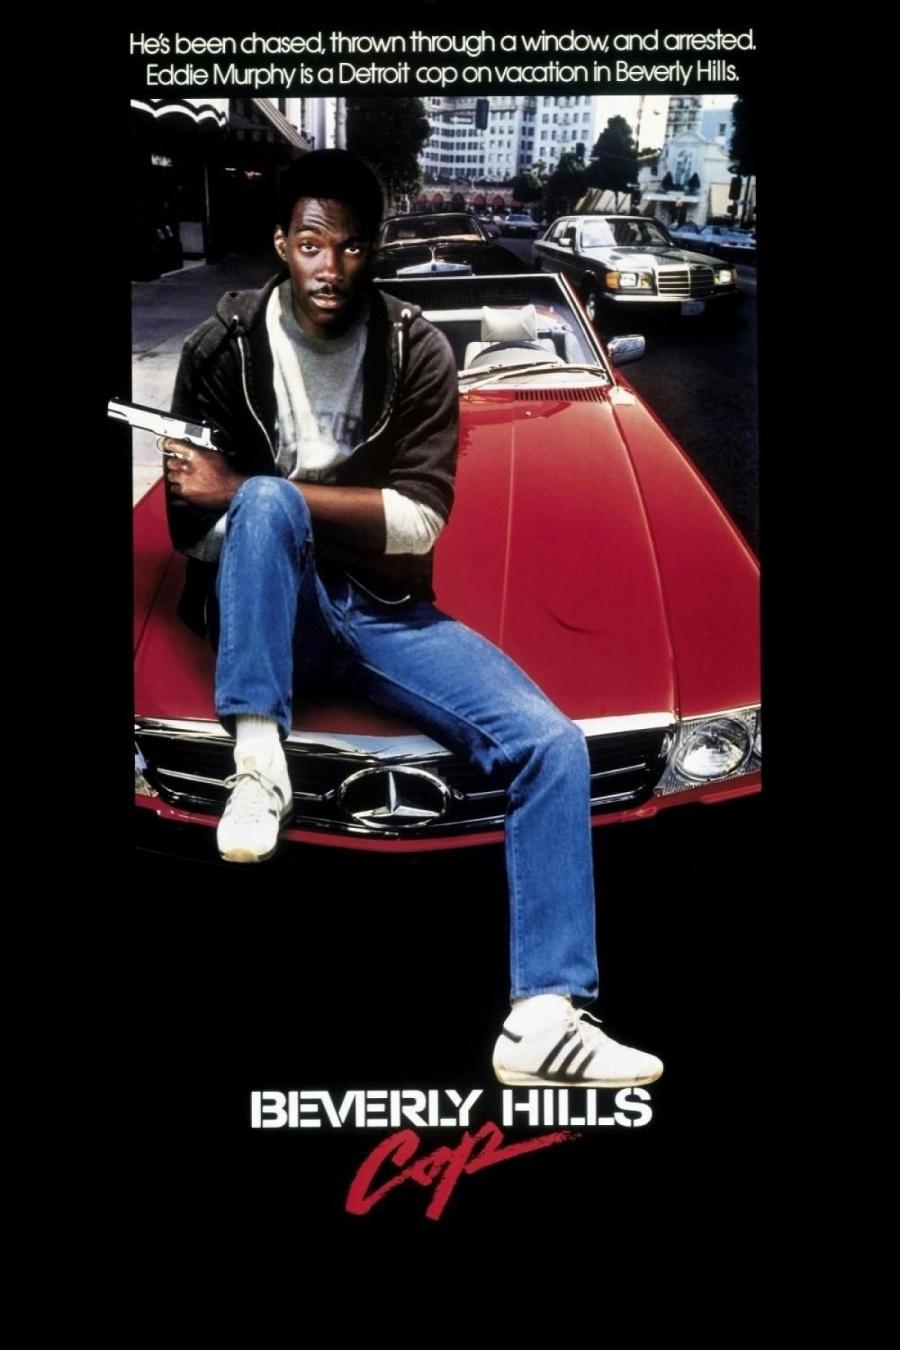 Cartel de Superdetective en Hollywood, de 1984